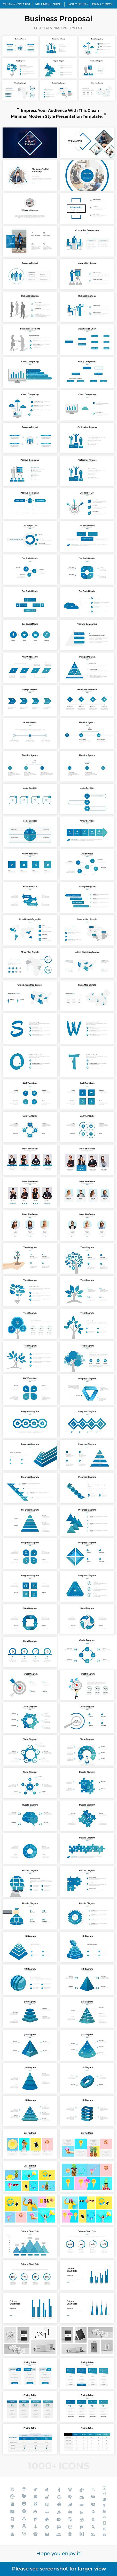 Business Proposal Powerpoint Presentation Template Pinterest